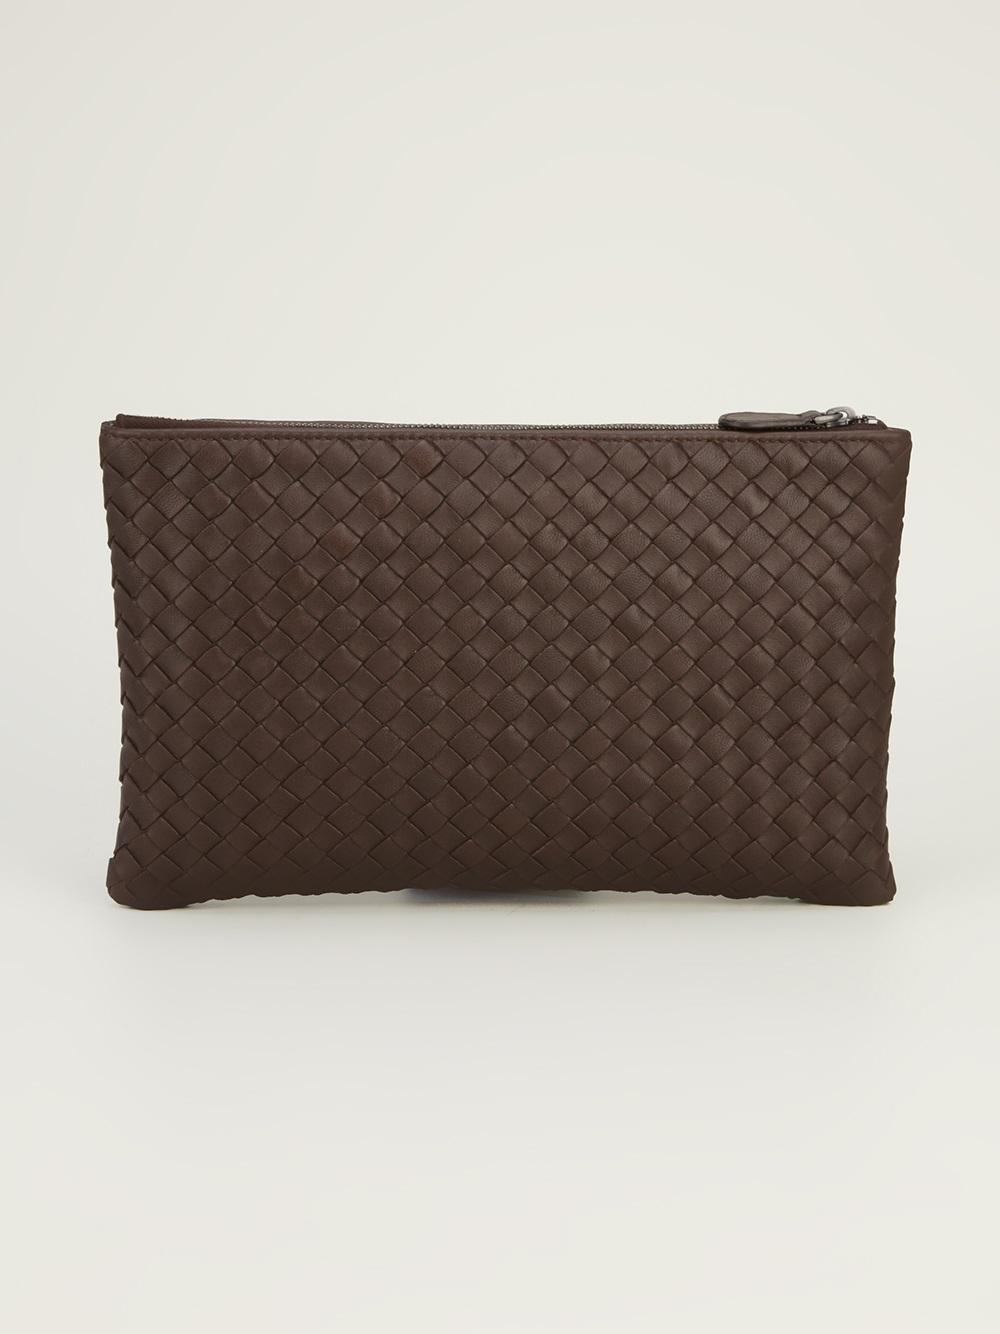 lyst bottega veneta bottega veneta clutch bag in brown. Black Bedroom Furniture Sets. Home Design Ideas